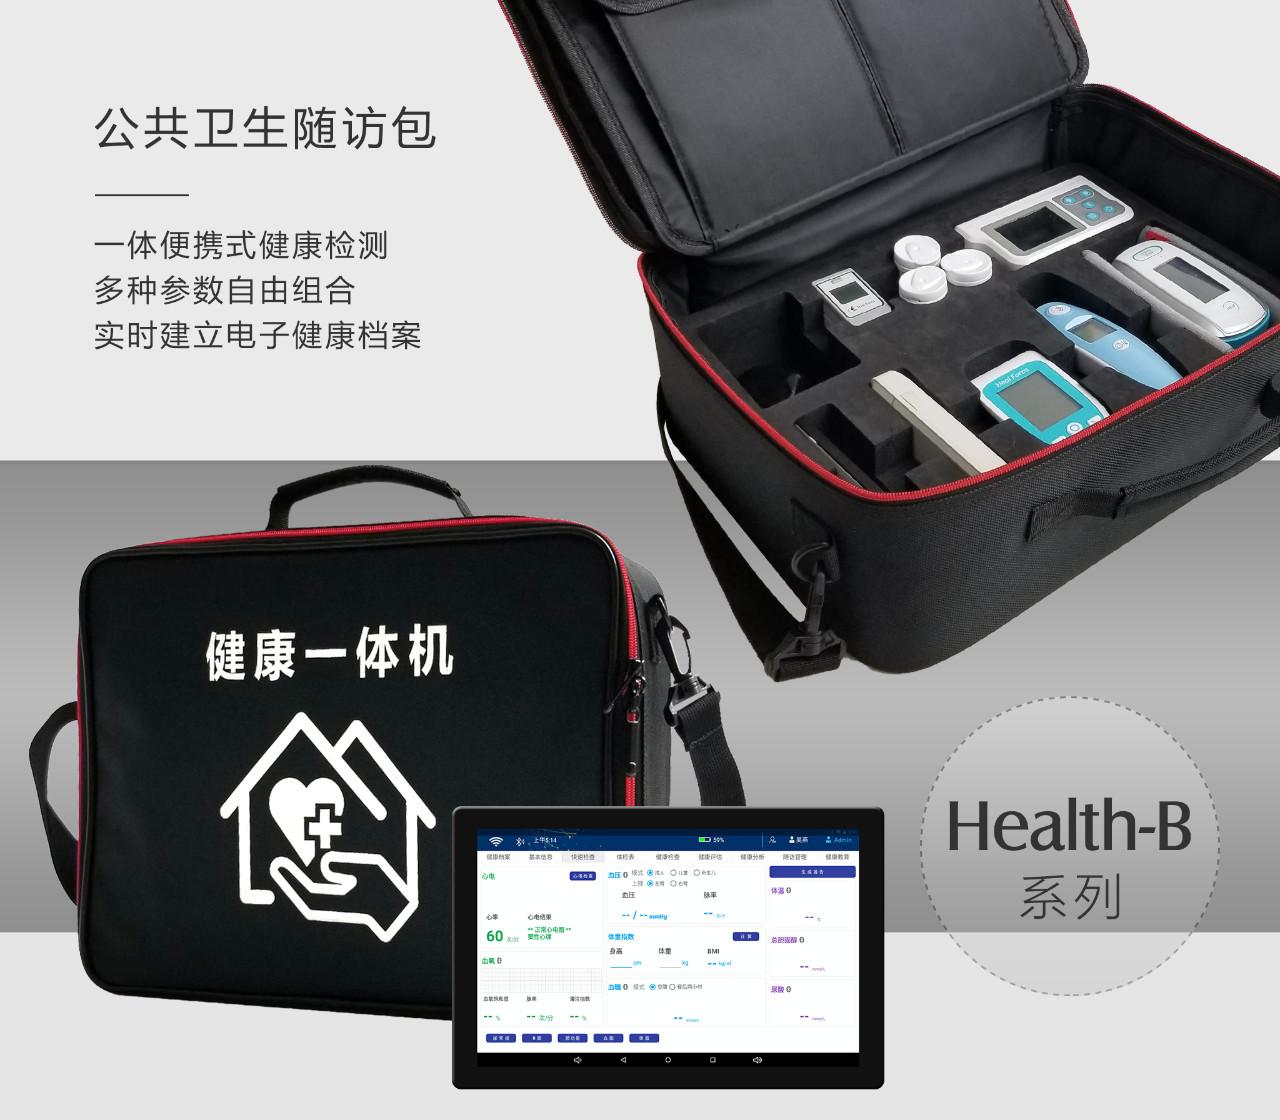 Health-B 系列